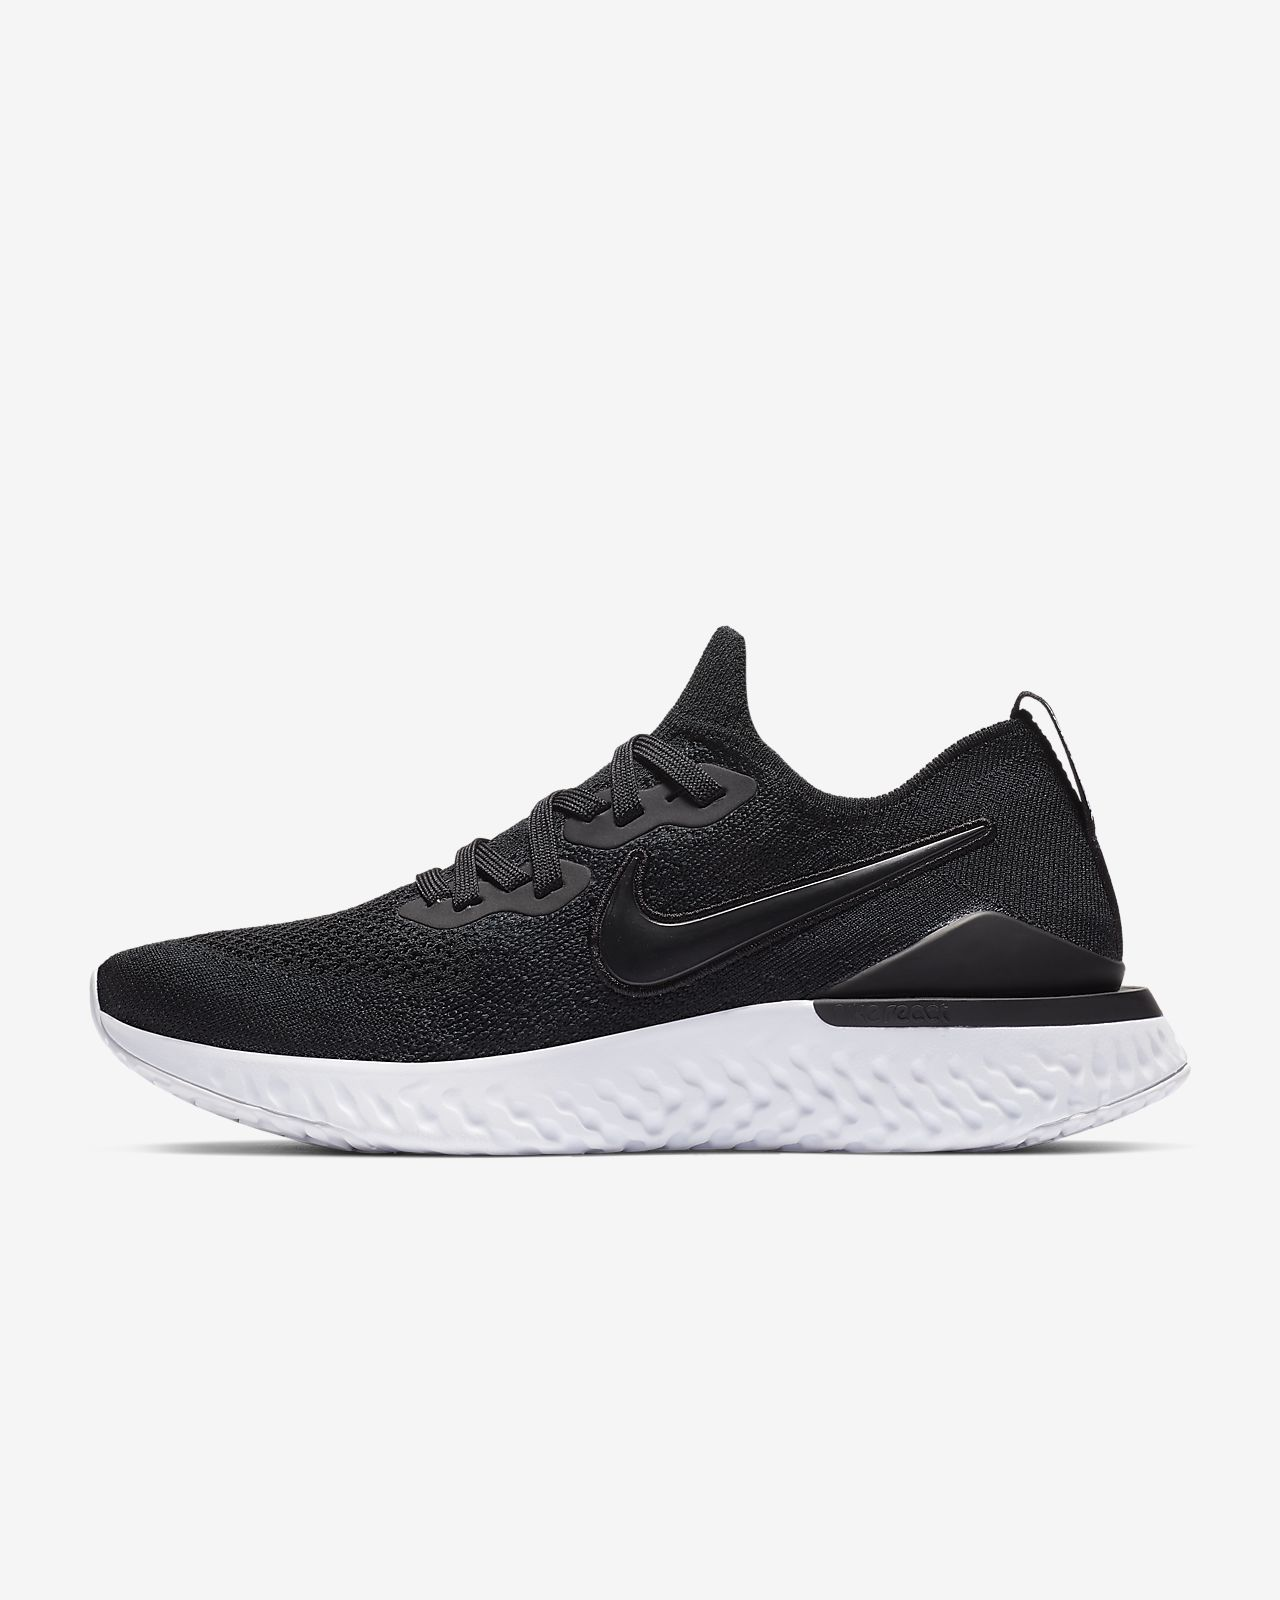 Sapatilhas de running Nike Epic React Flyknit 2 para mulher